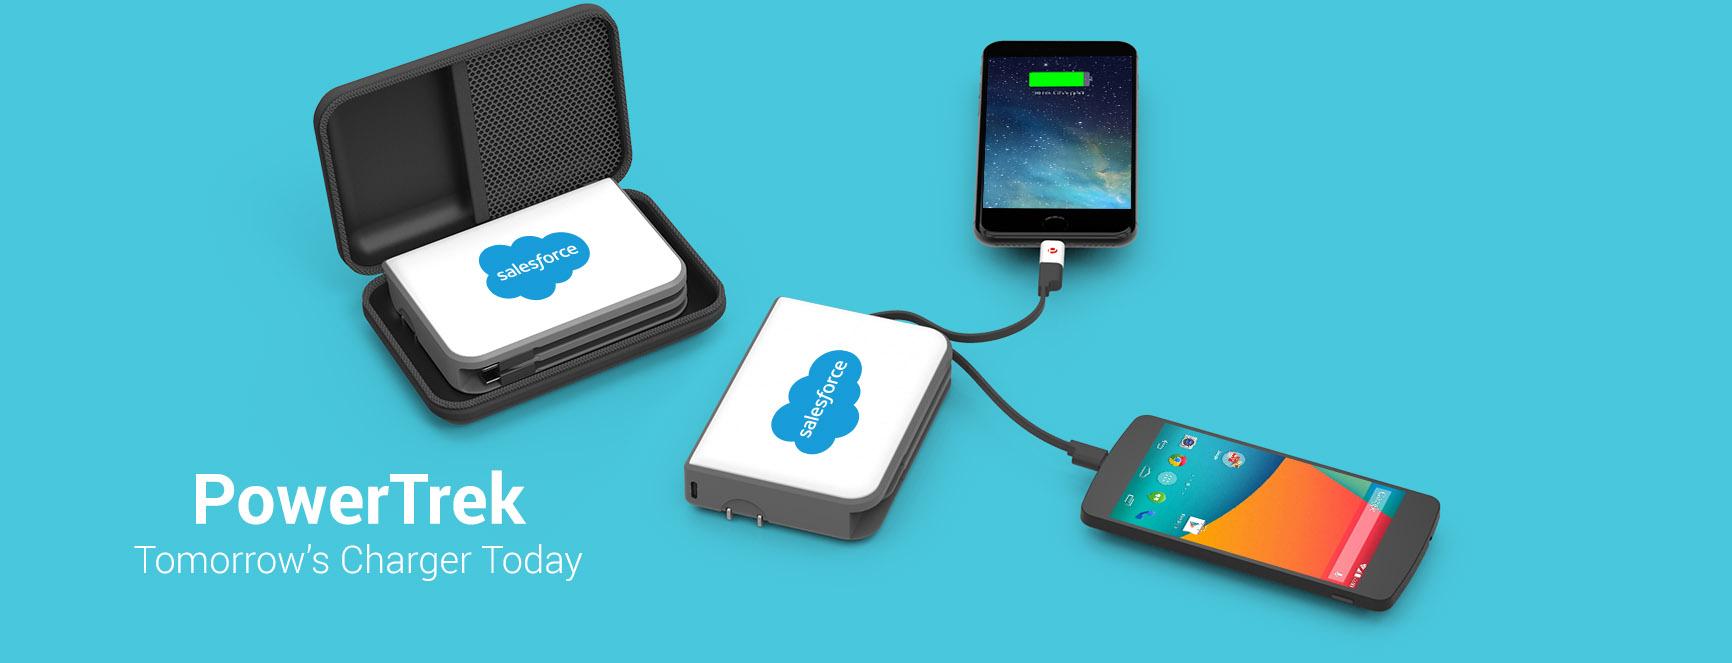 PowerTrek charging multiple devices